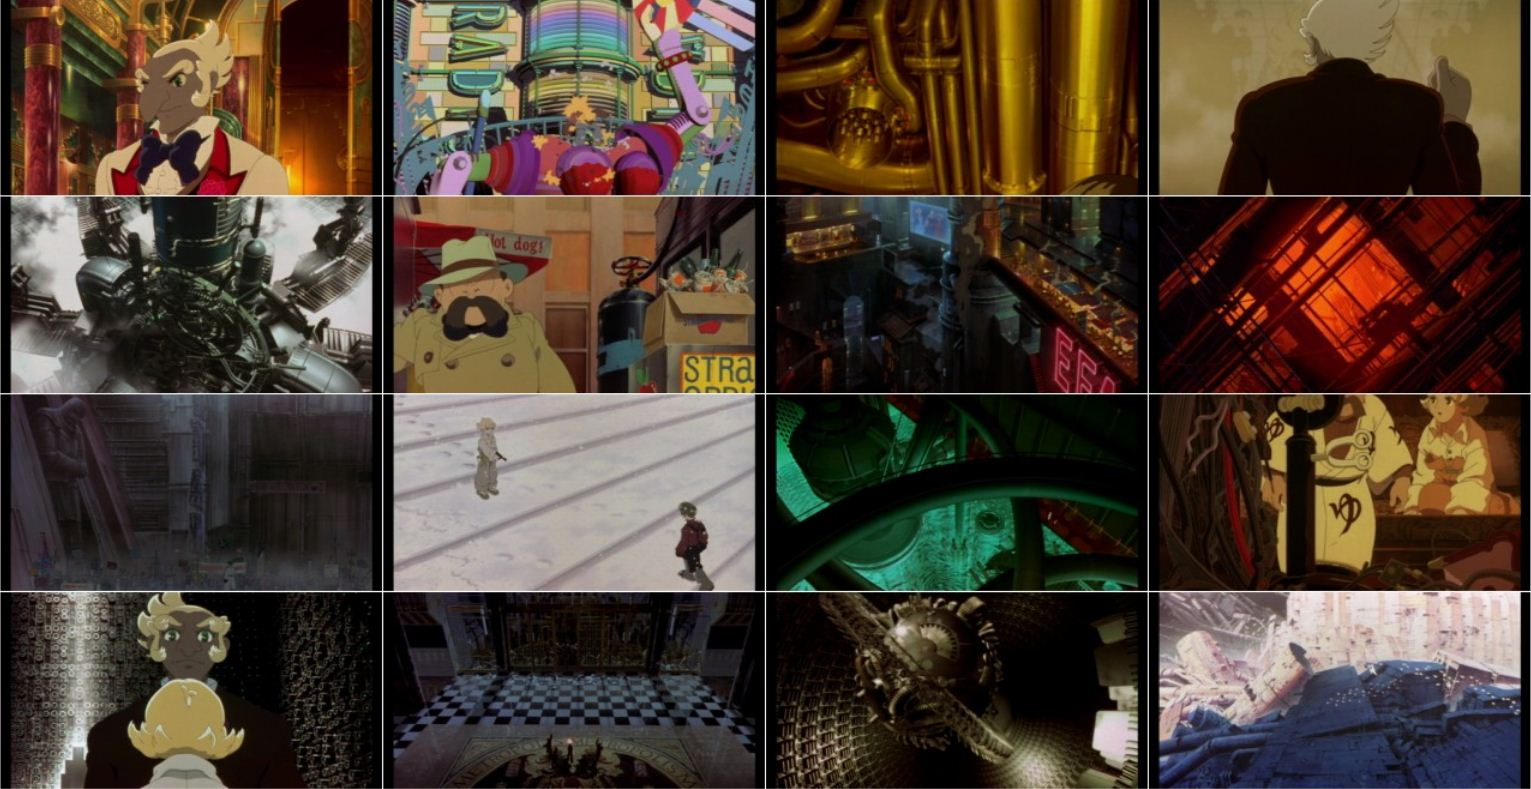 Metropolis 2 دانلود دوبله فارسی انیمیشن متروپلیس